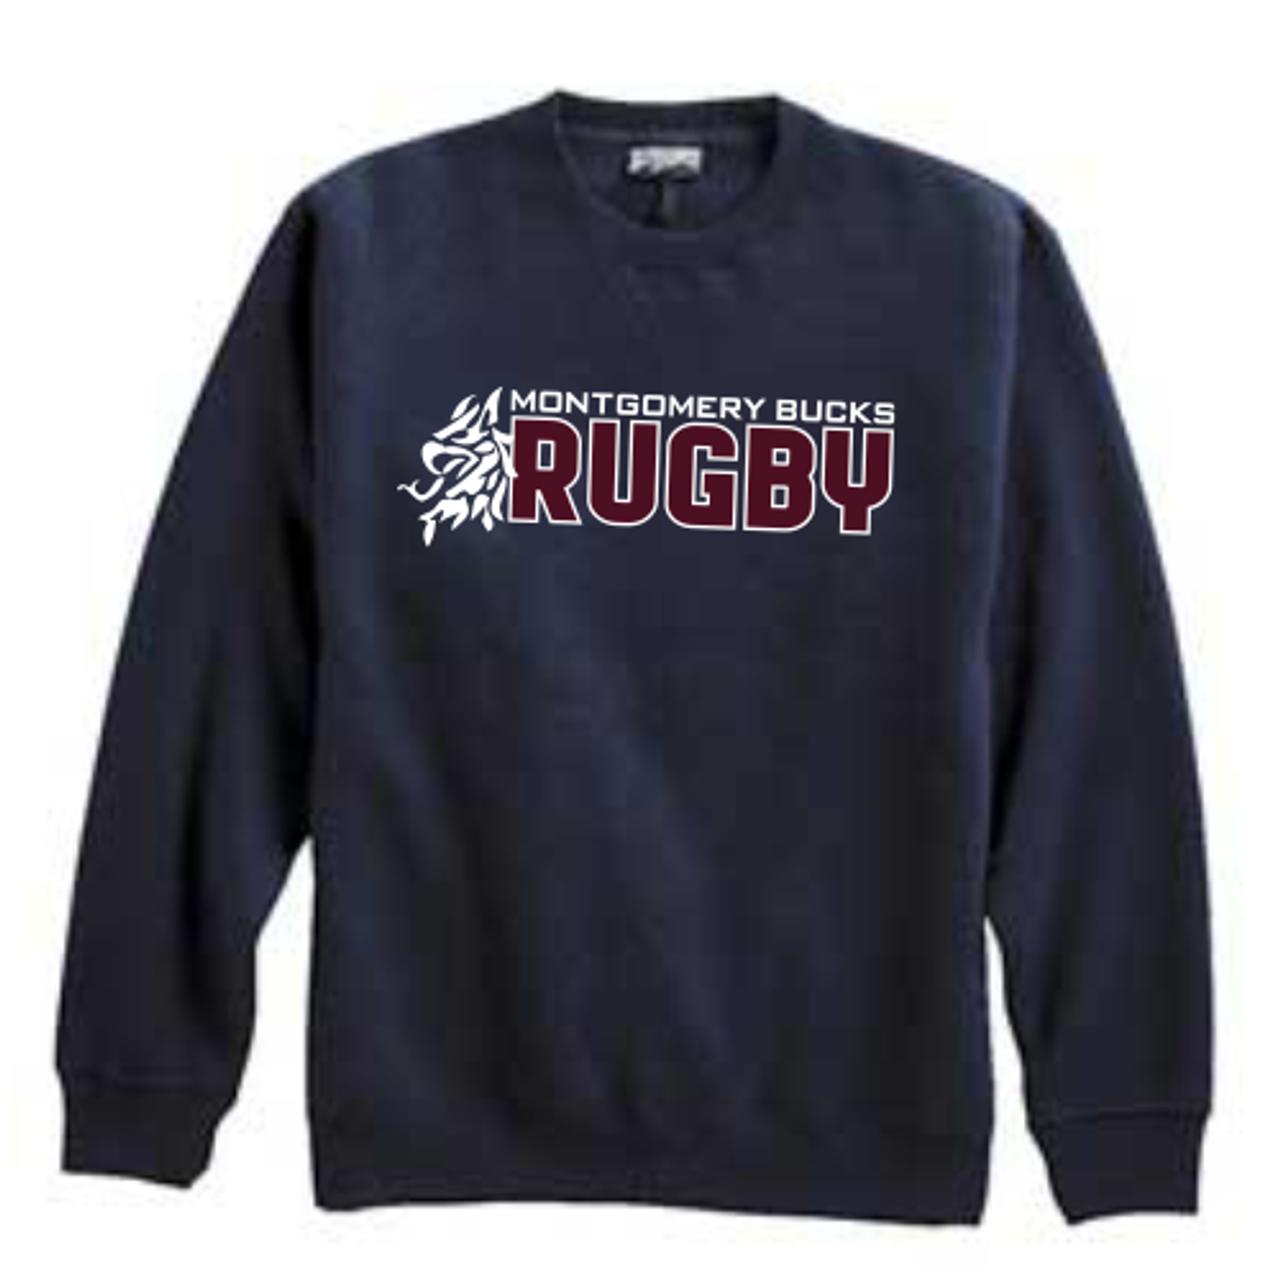 MB Rugby Crewneck Sweatshirt, Navy